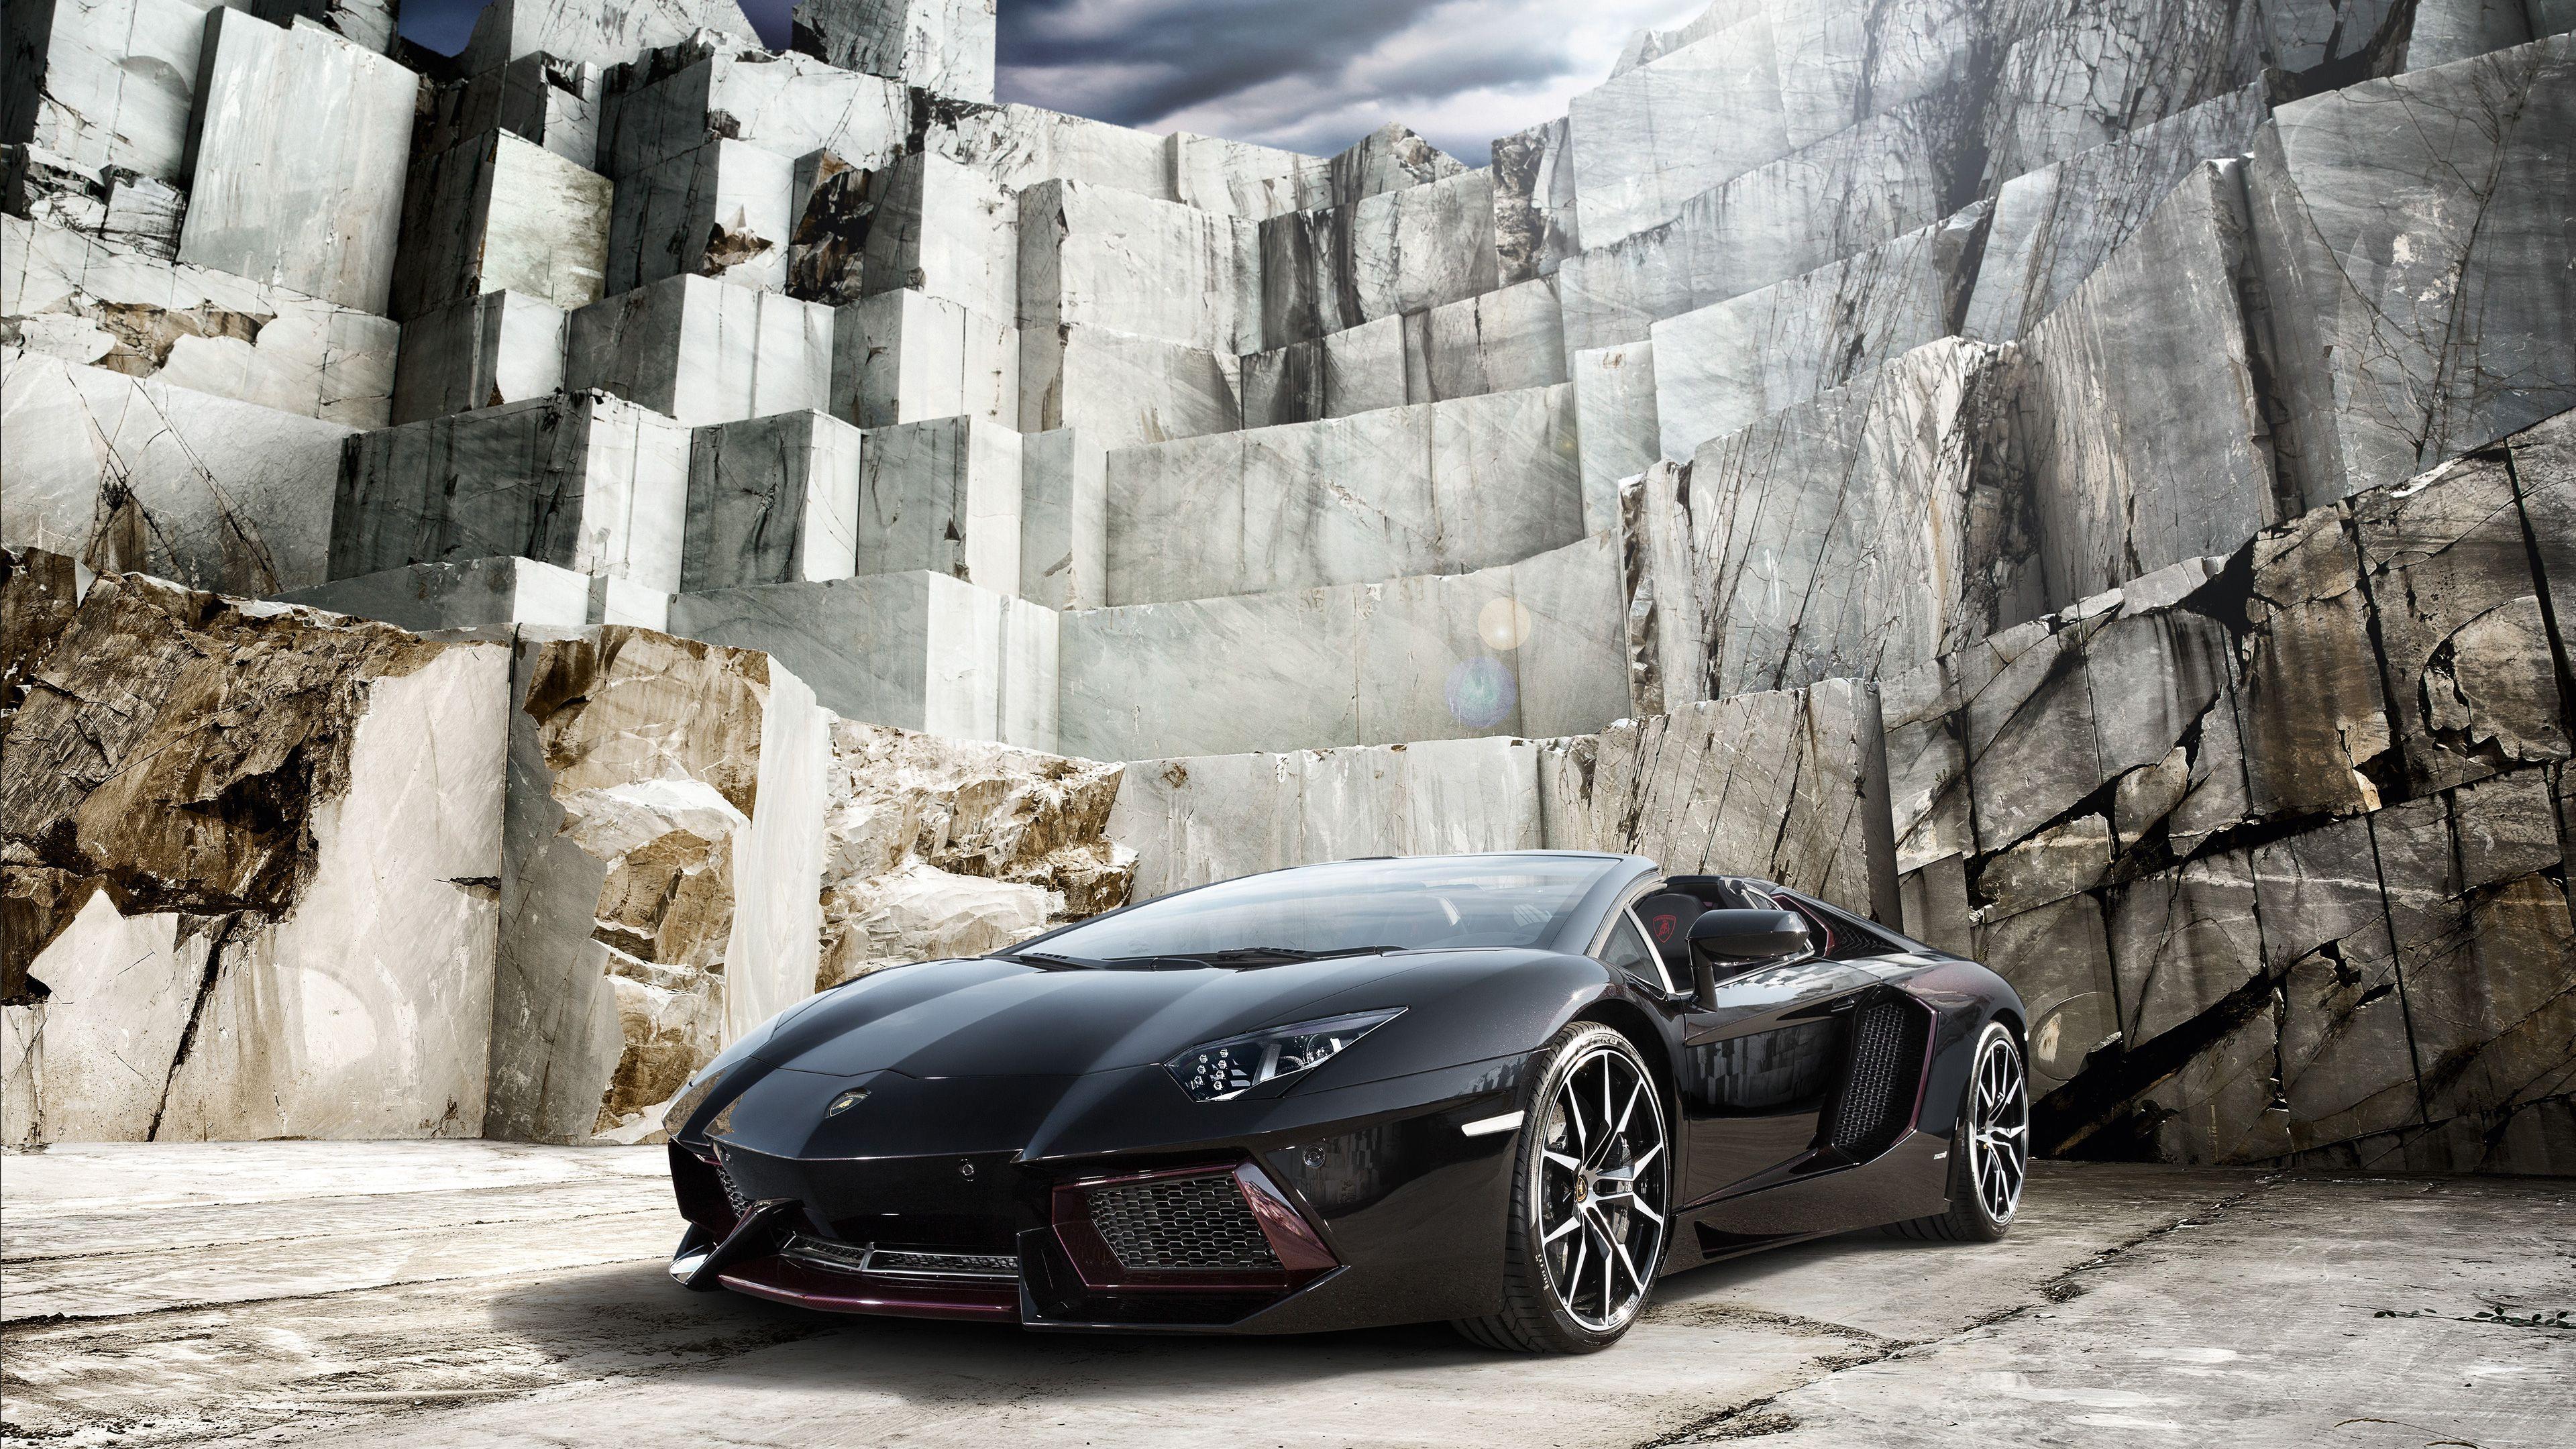 Download hd wallpapers for free on unsplash. 1080x1920 Wallpaper Black Lamborghini Car 4k Wallpaper